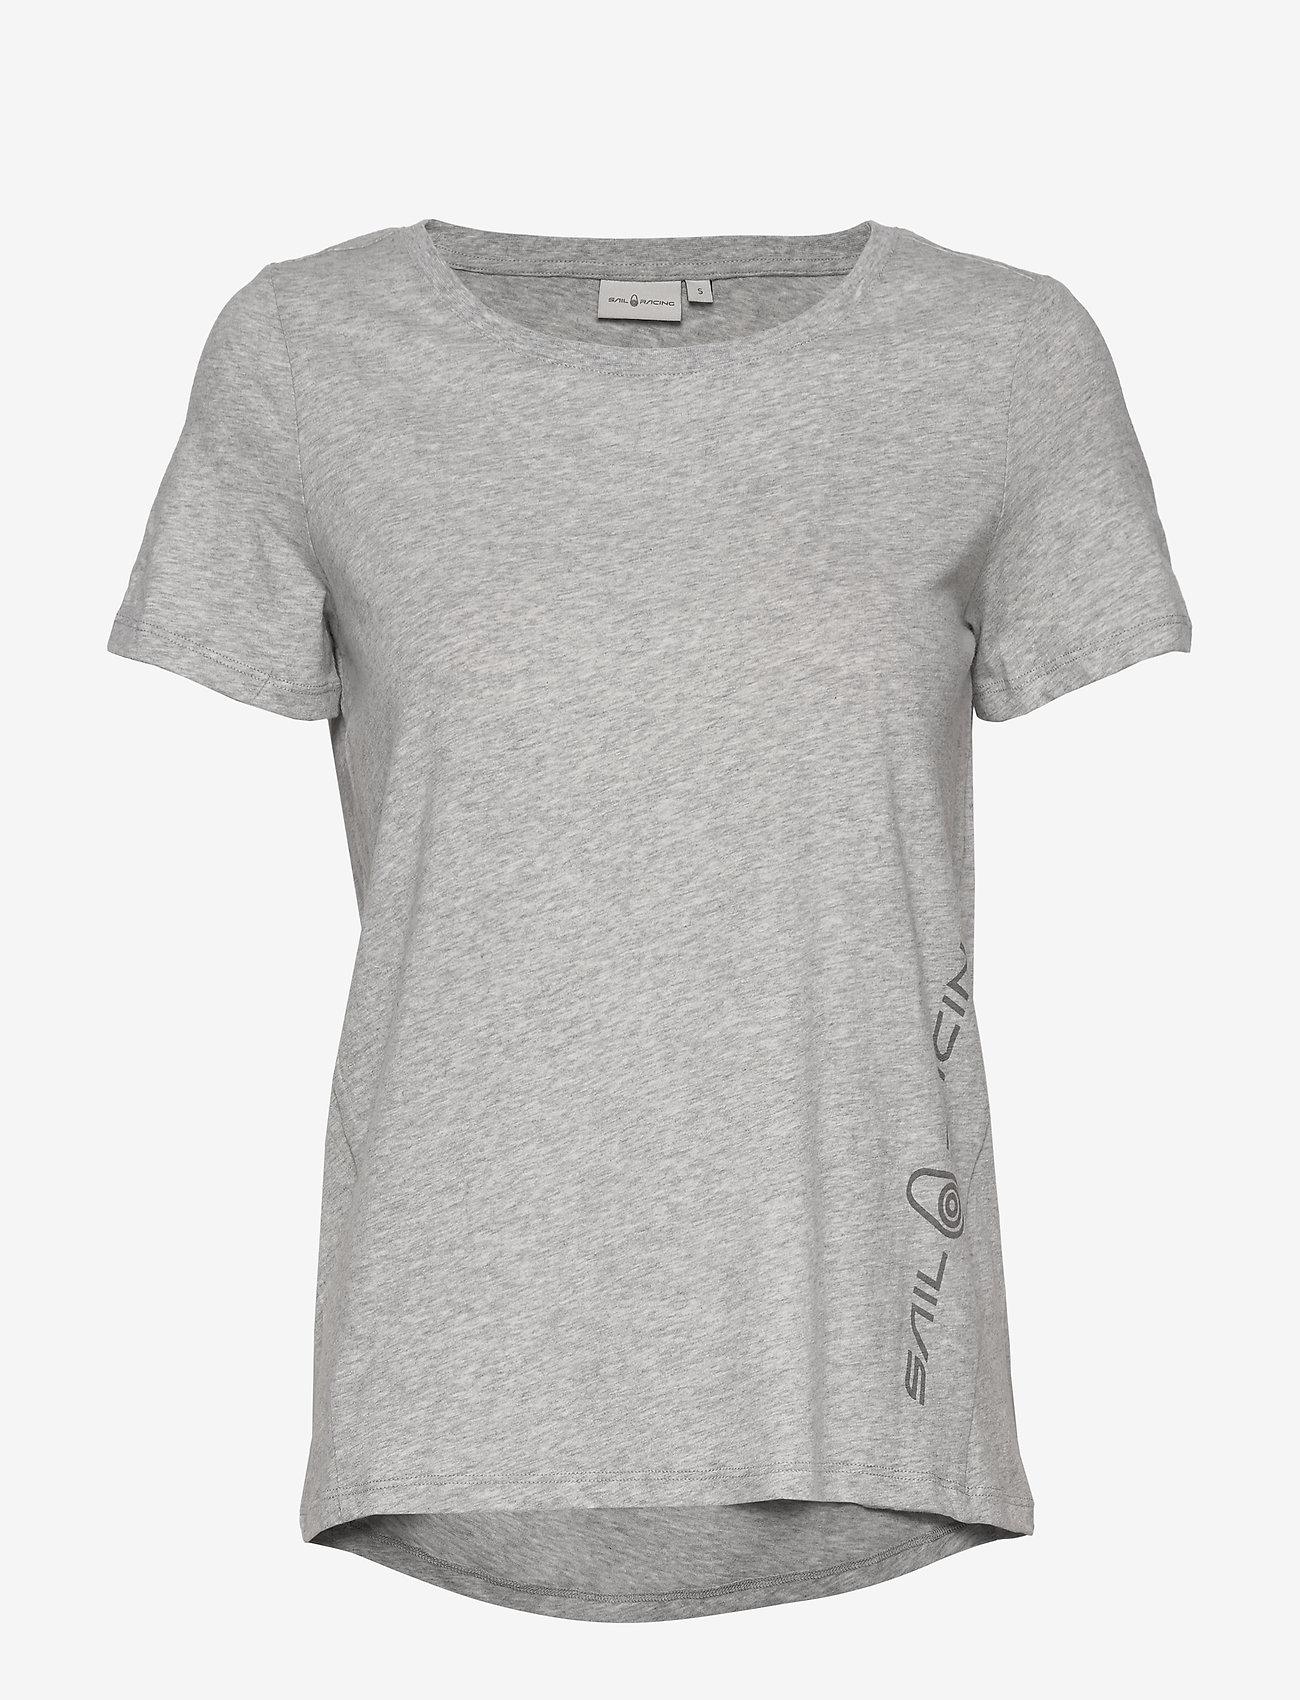 Sail Racing - W GAIL TEE#2 - t-shirts - grey mel - 0